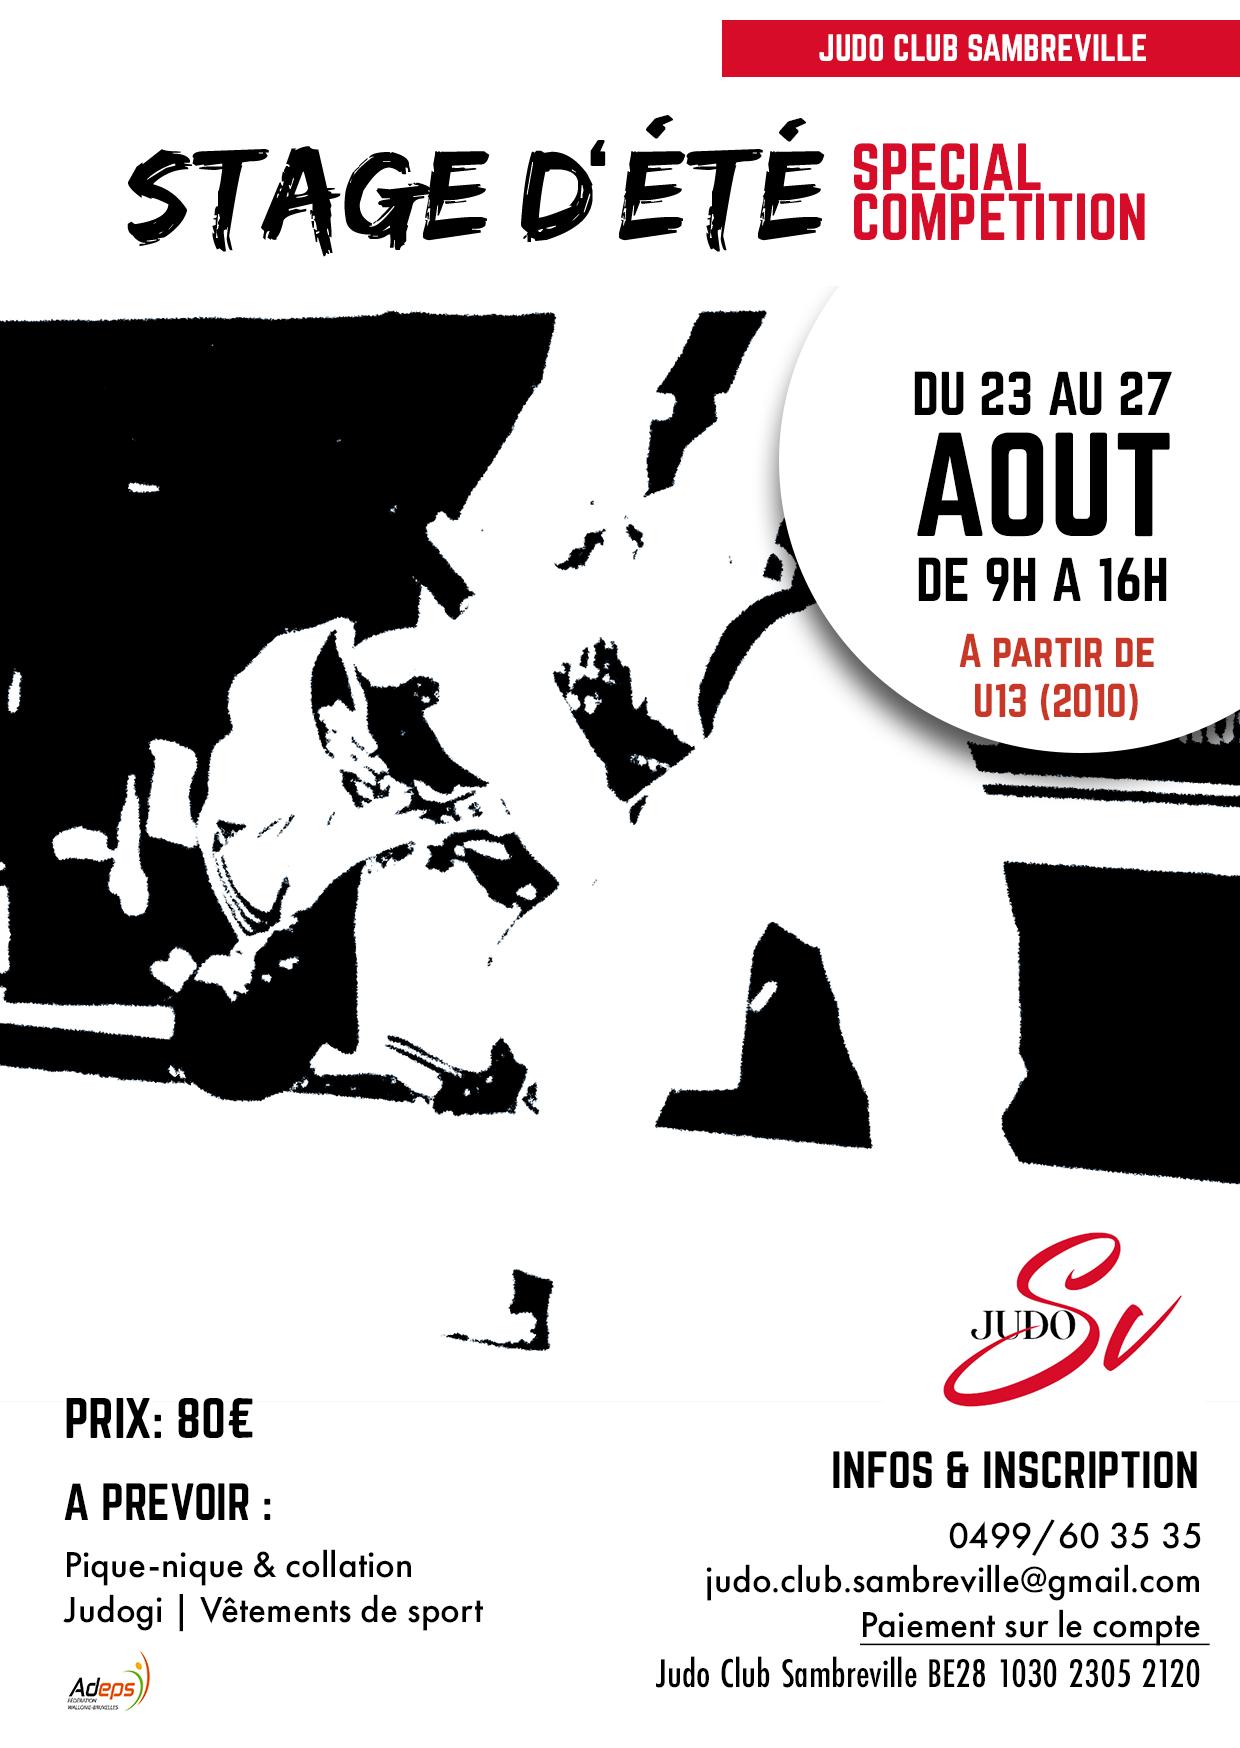 Stage judo à Sambreville